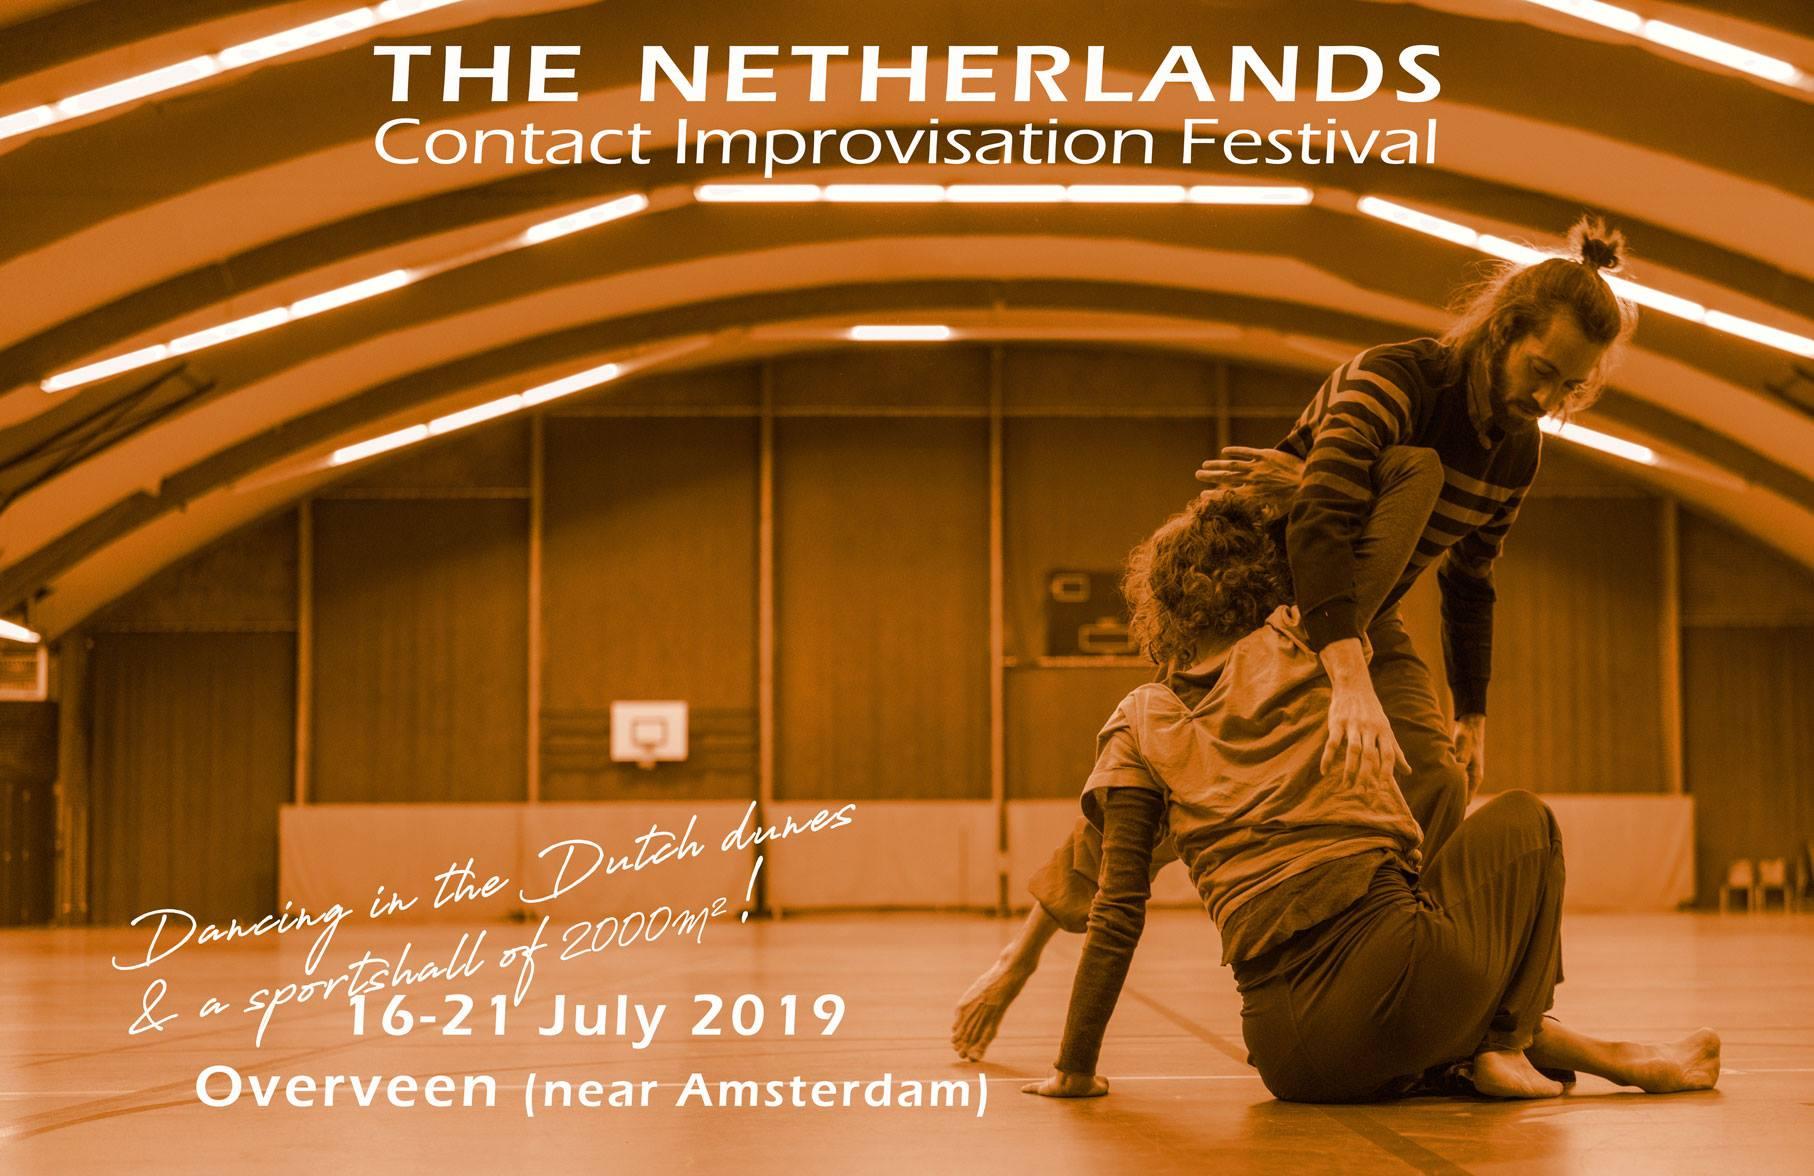 NL Contact Improvisation Festival